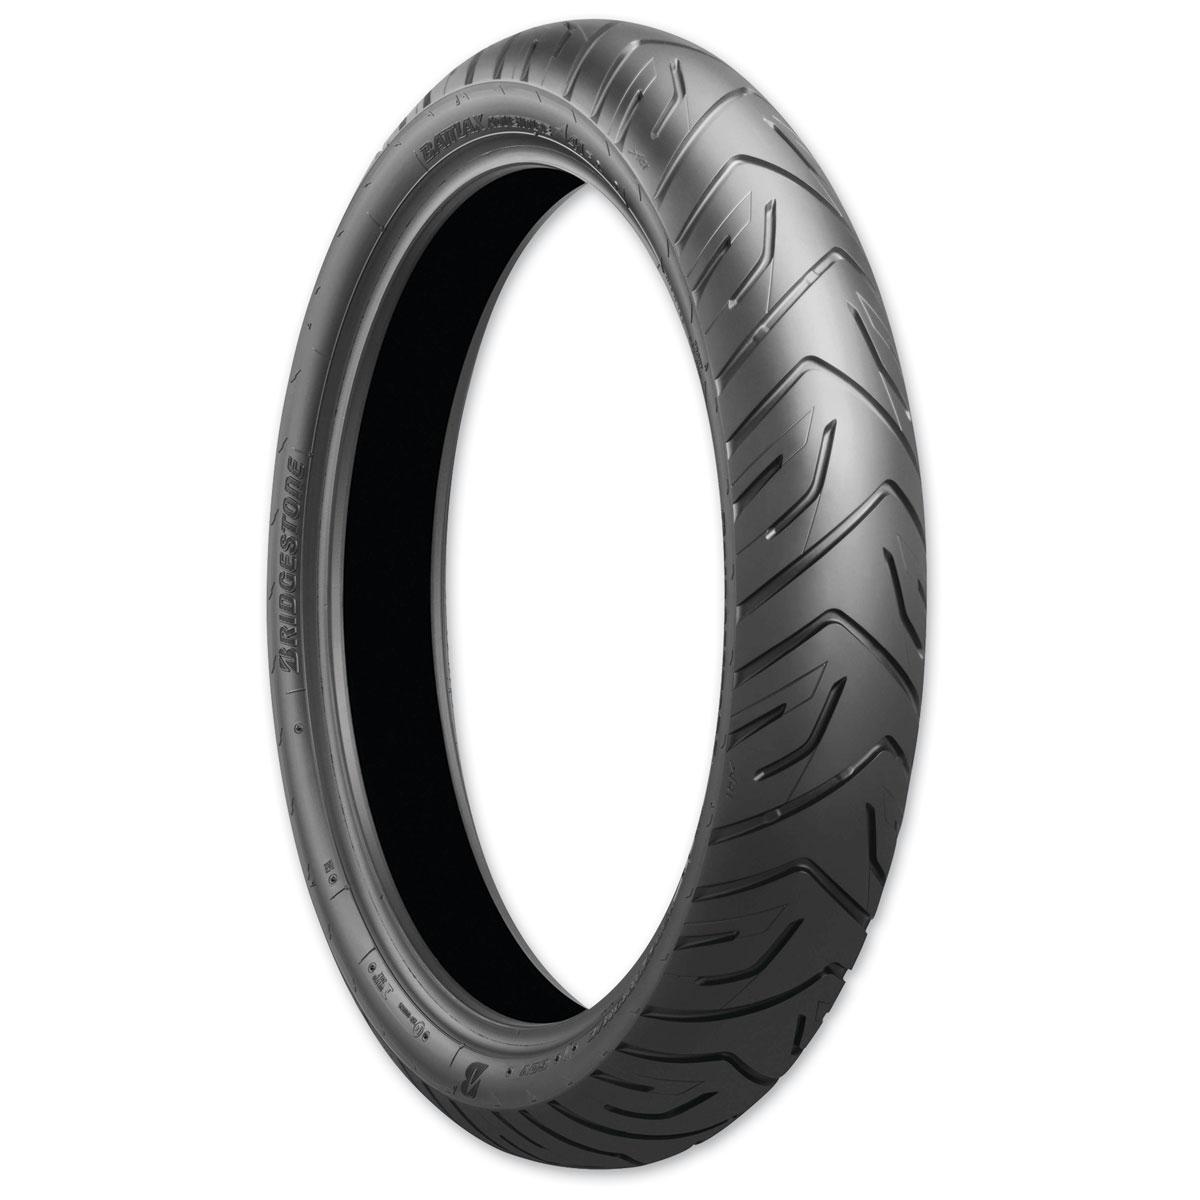 Bridgestone A41 110/80R19 Front Tire